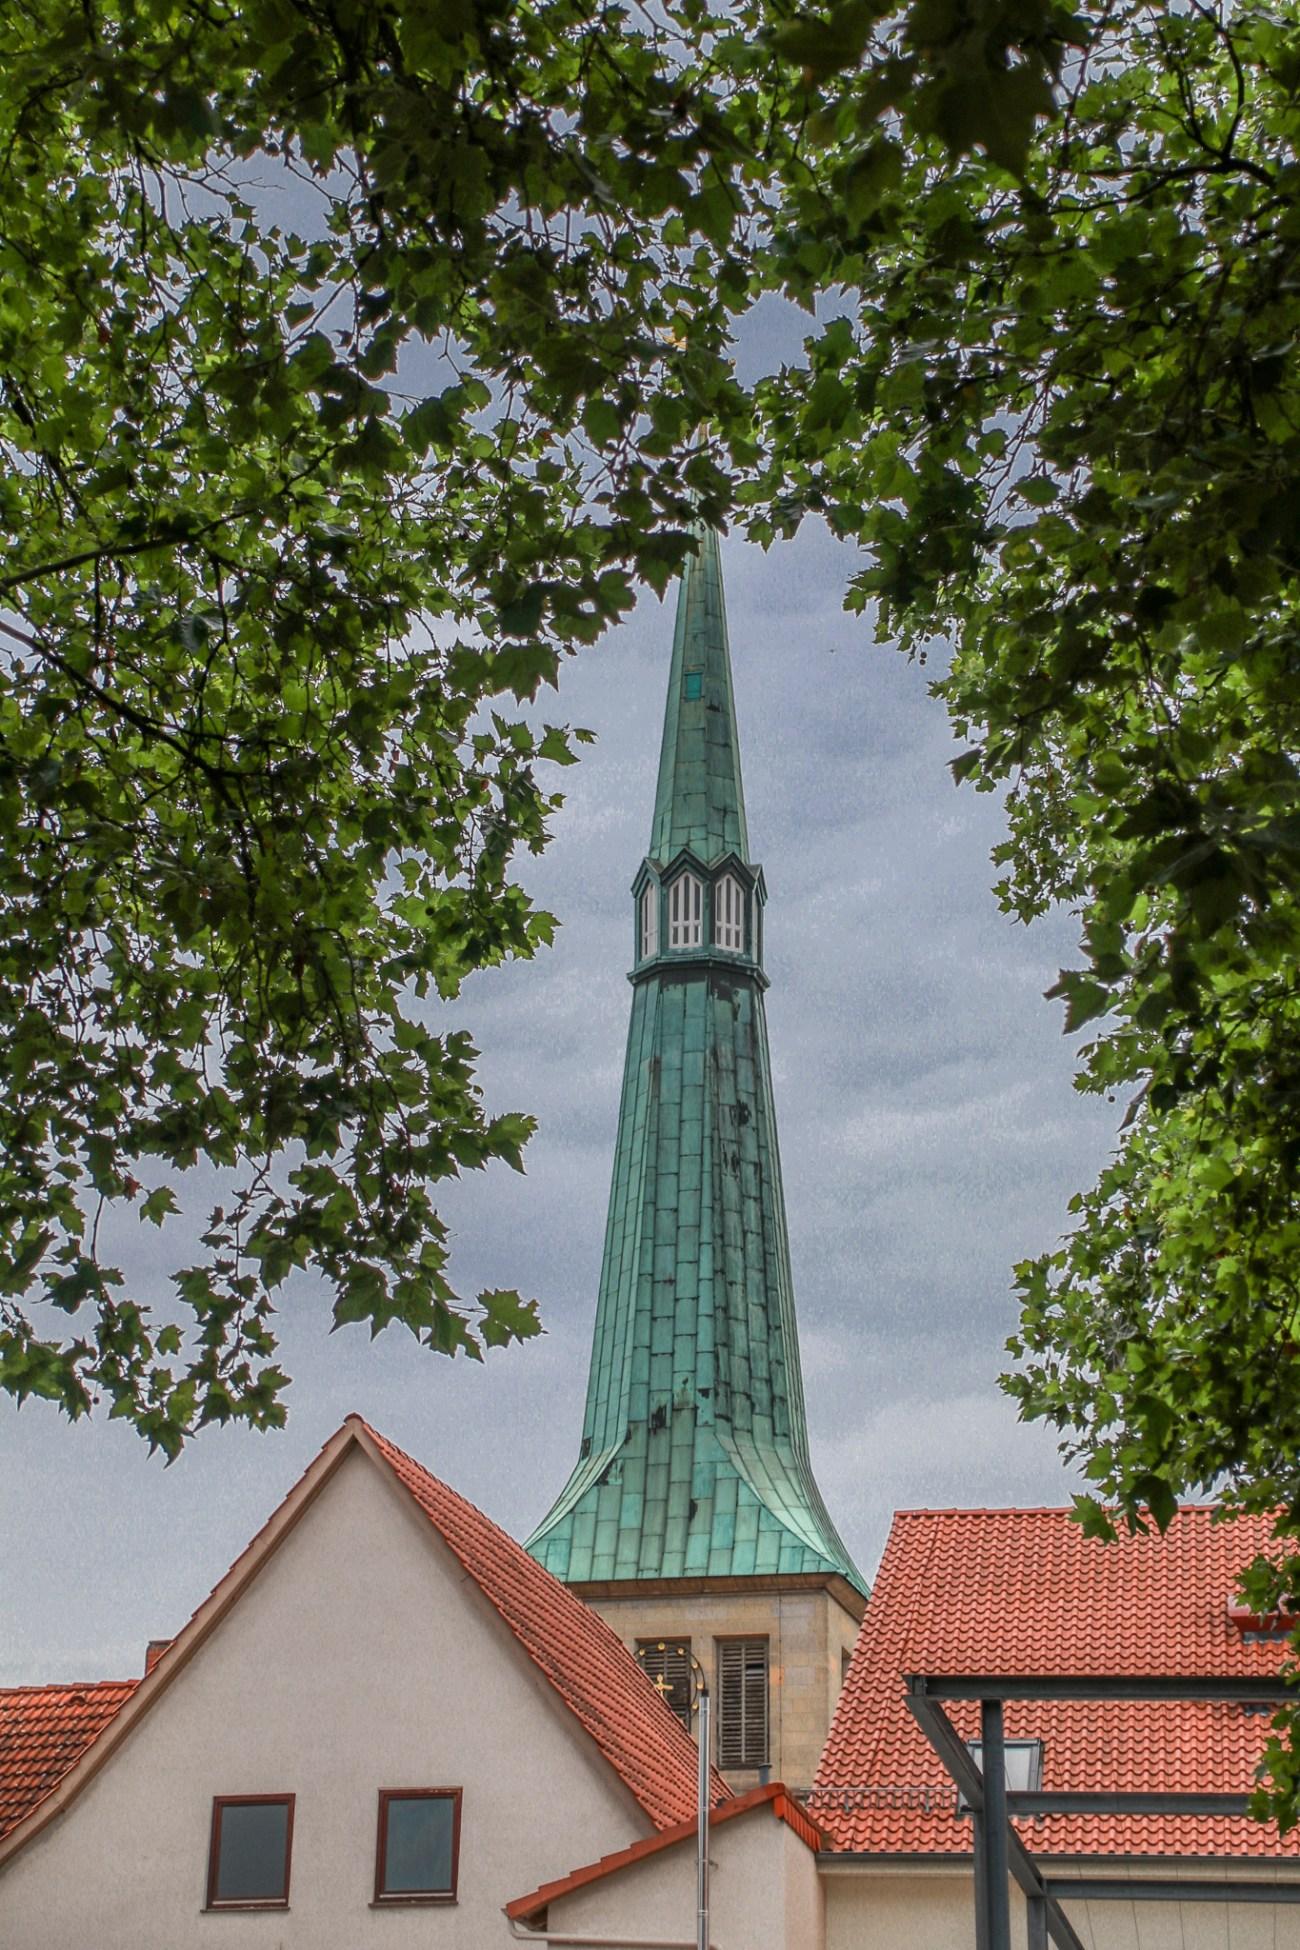 Hameln-tipps-marktkirche-turm